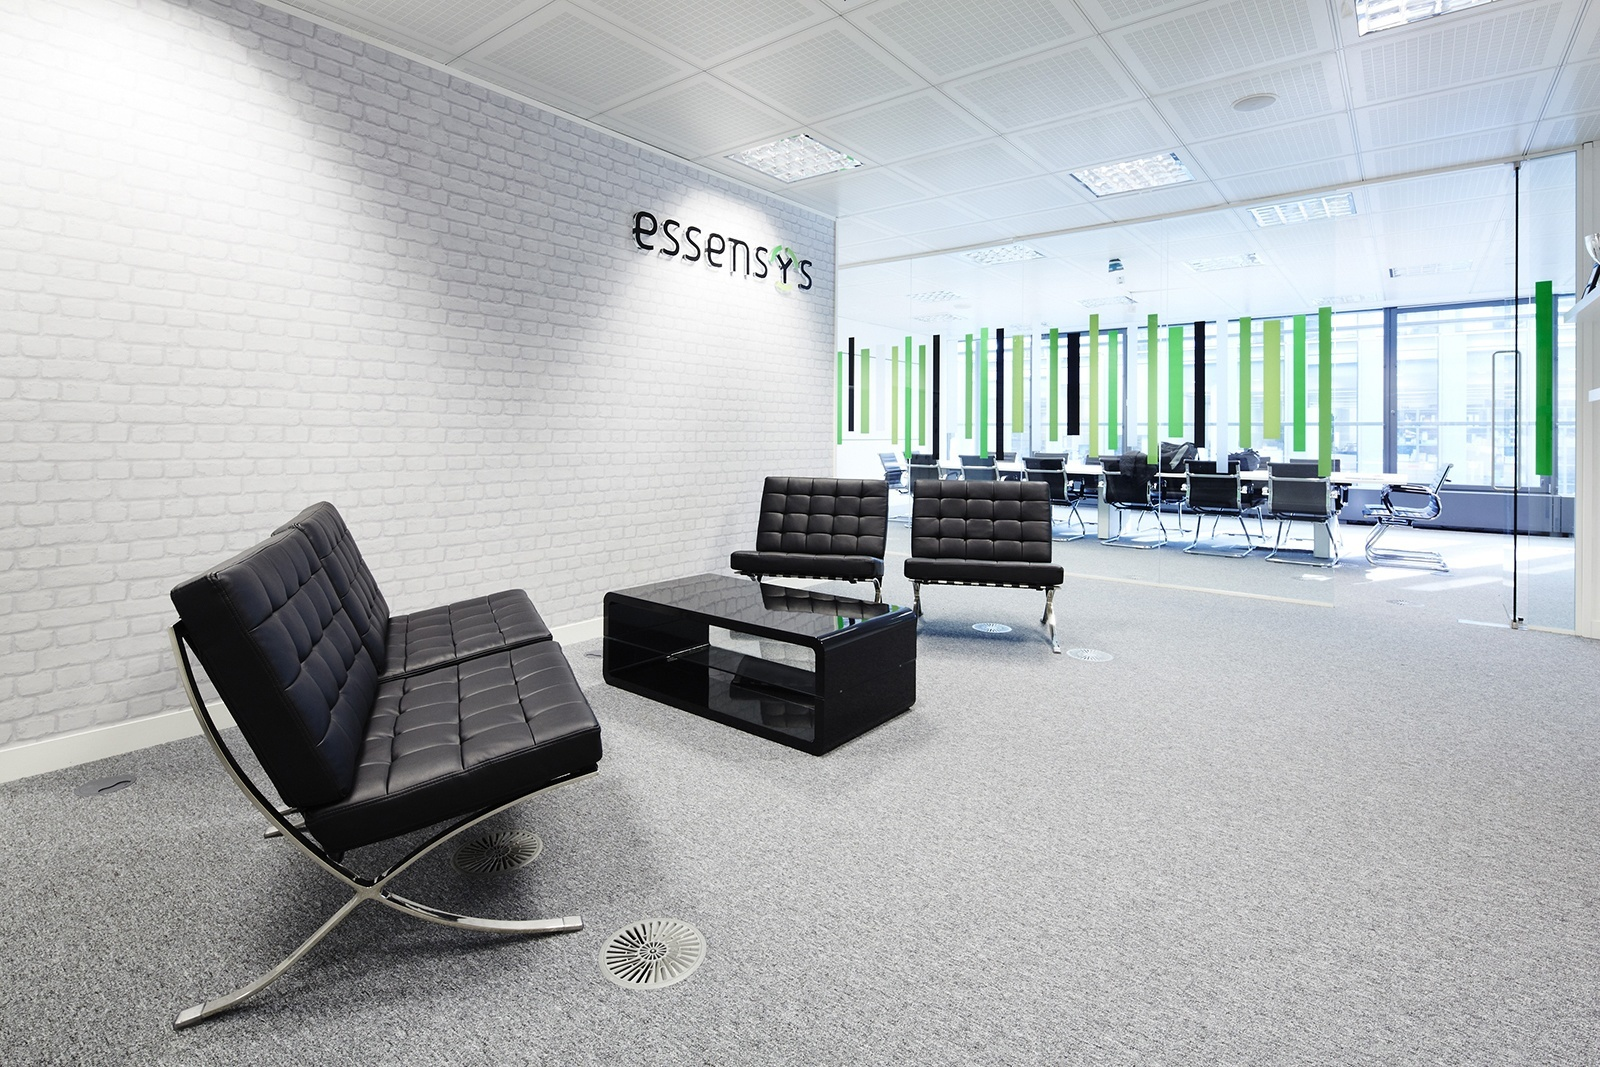 essensys-london-office-7